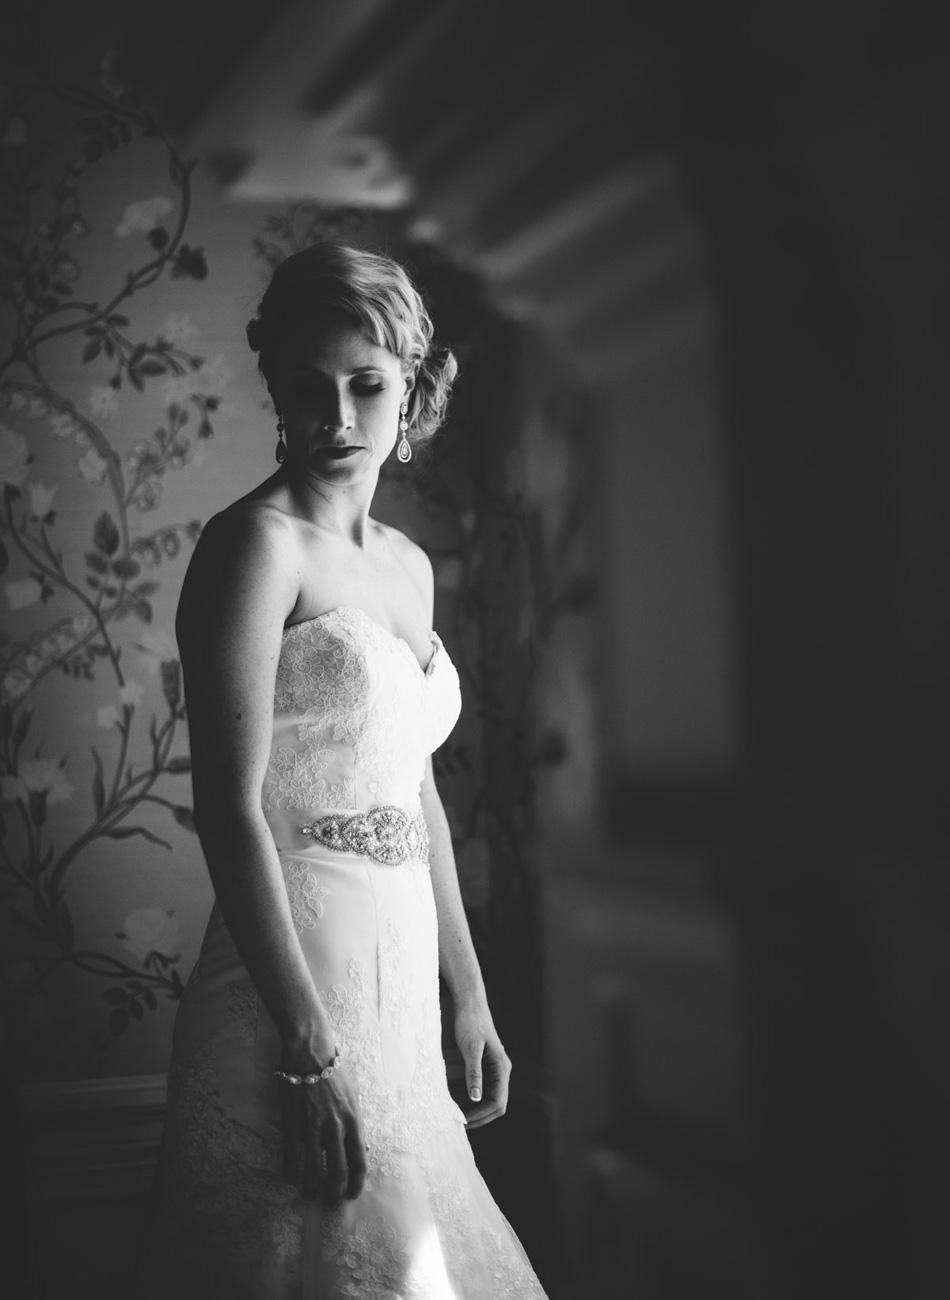 elegant bridal portrait by window black and white